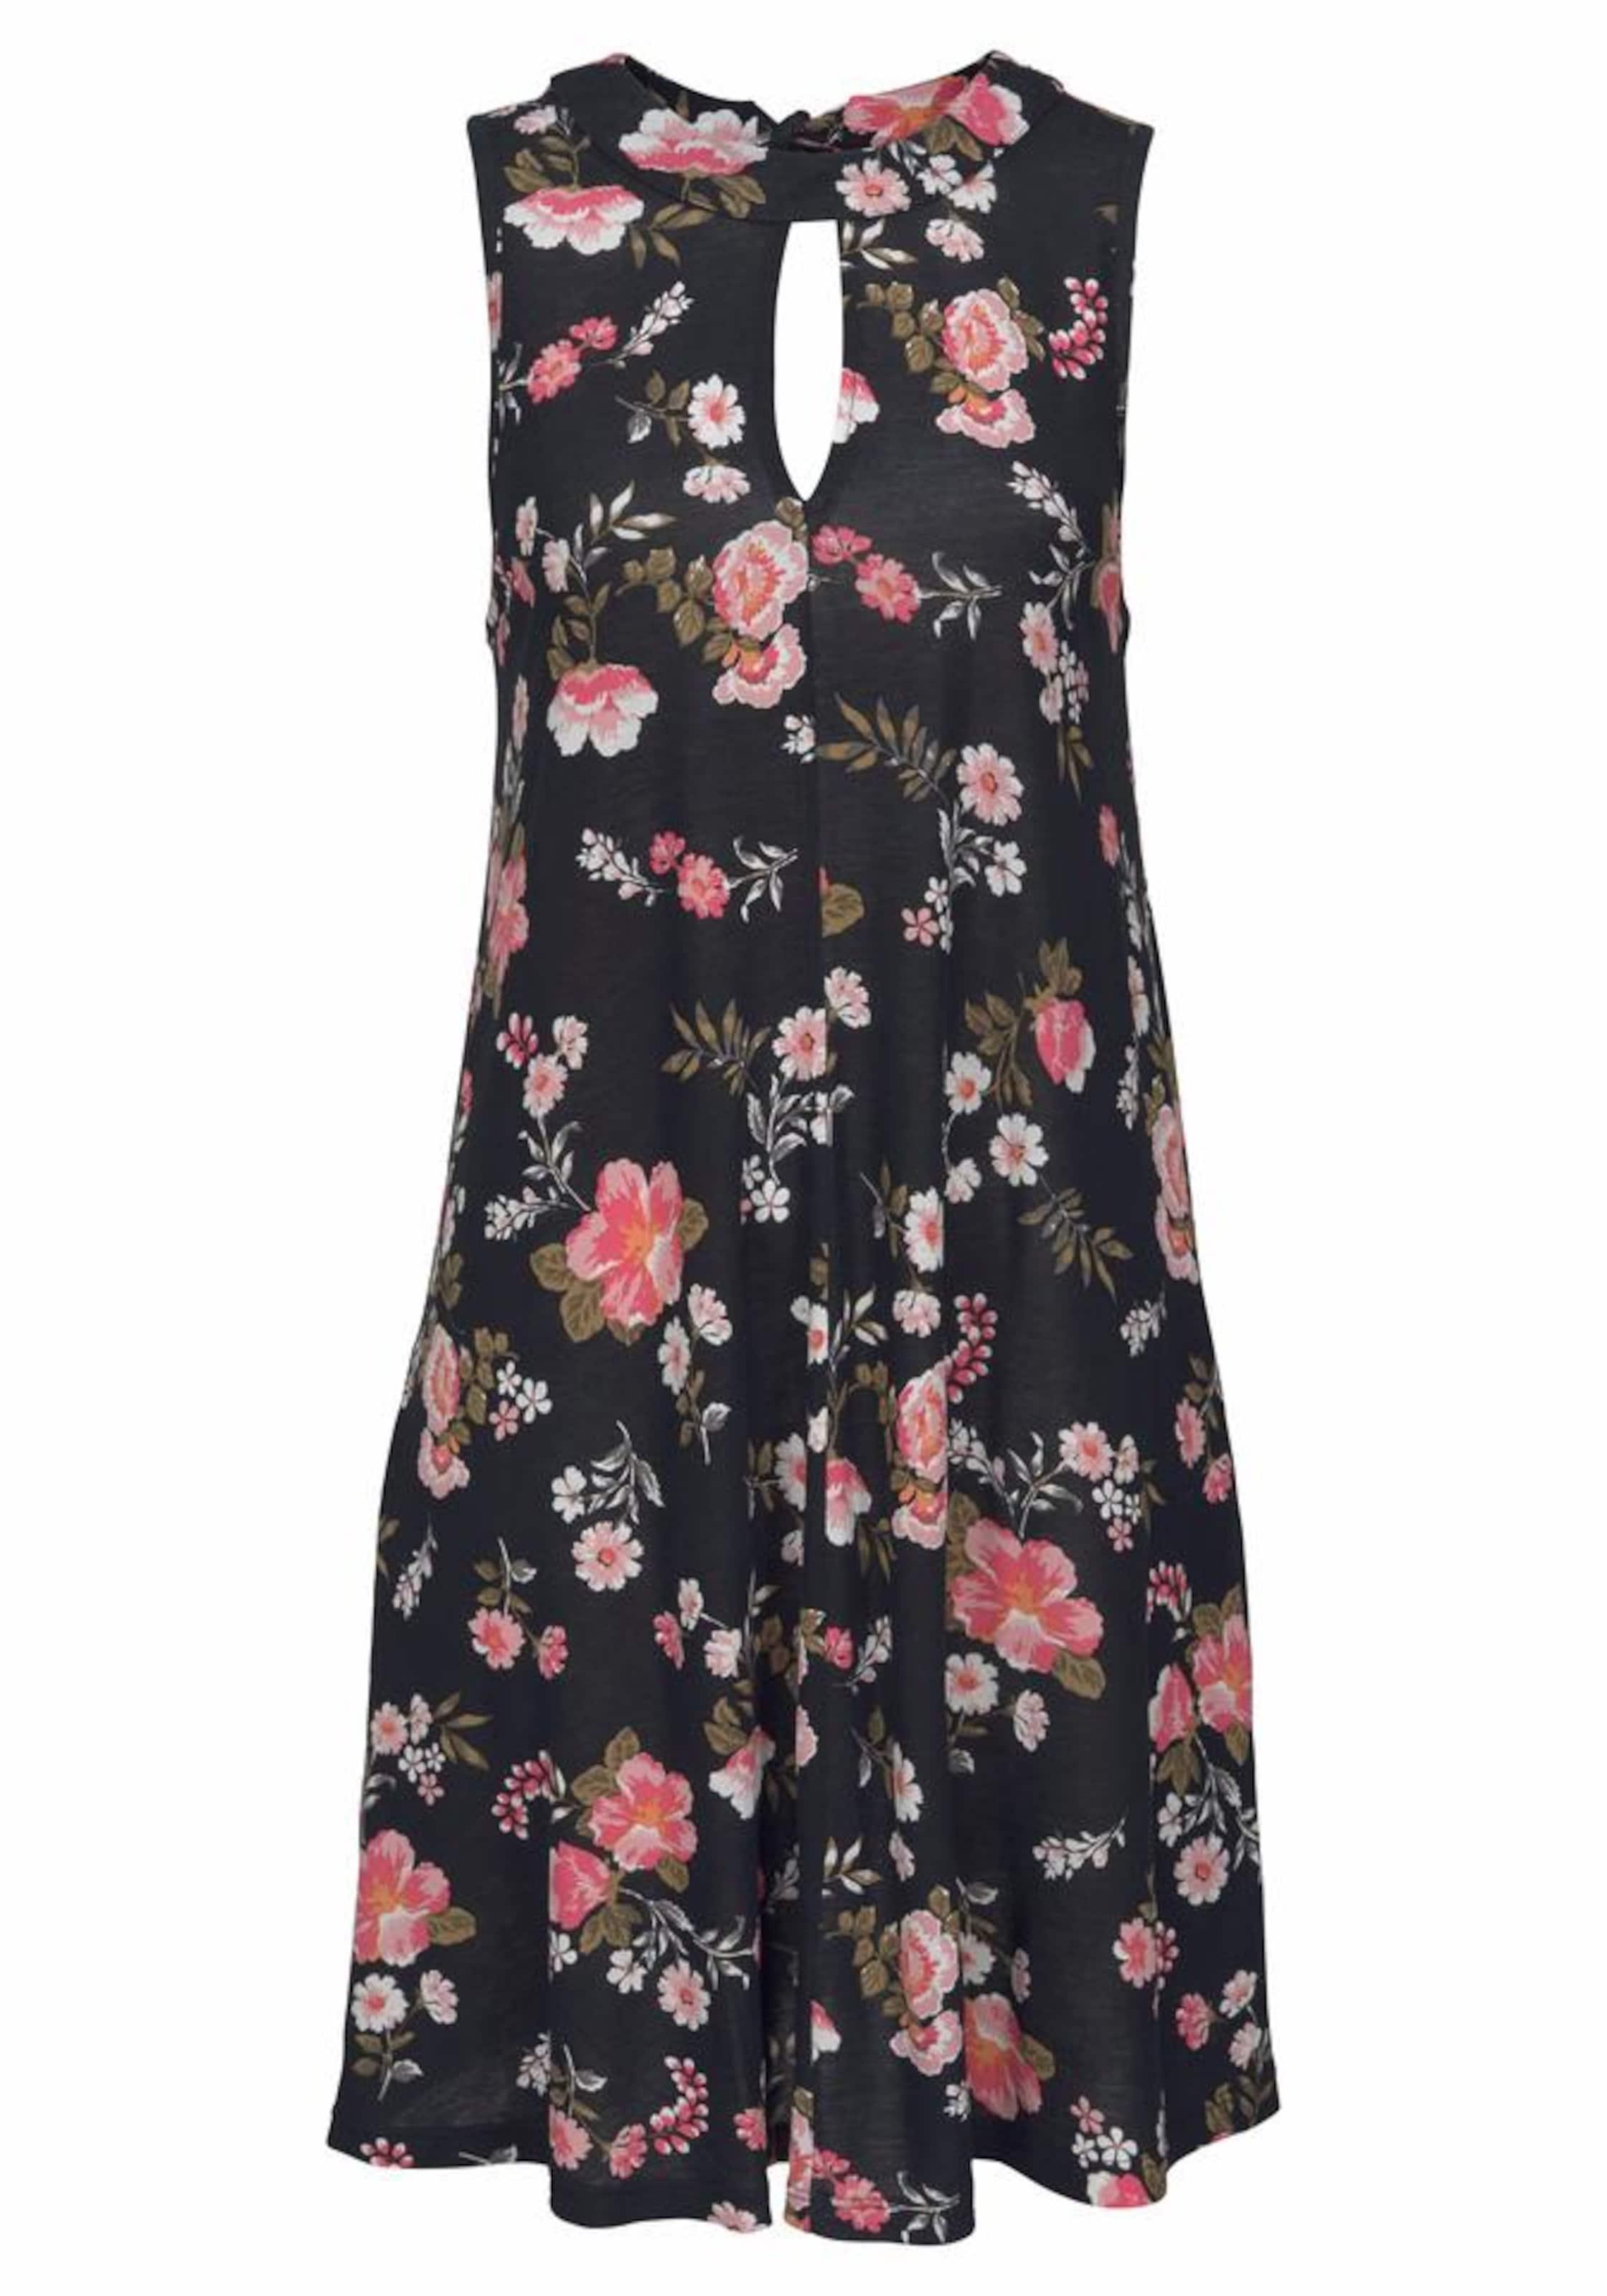 RosaSchwarz In RosaSchwarz Kleid Lascana Lascana Lascana Kleid Kleid In Lascana In In RosaSchwarz Kleid Nnm0wv8